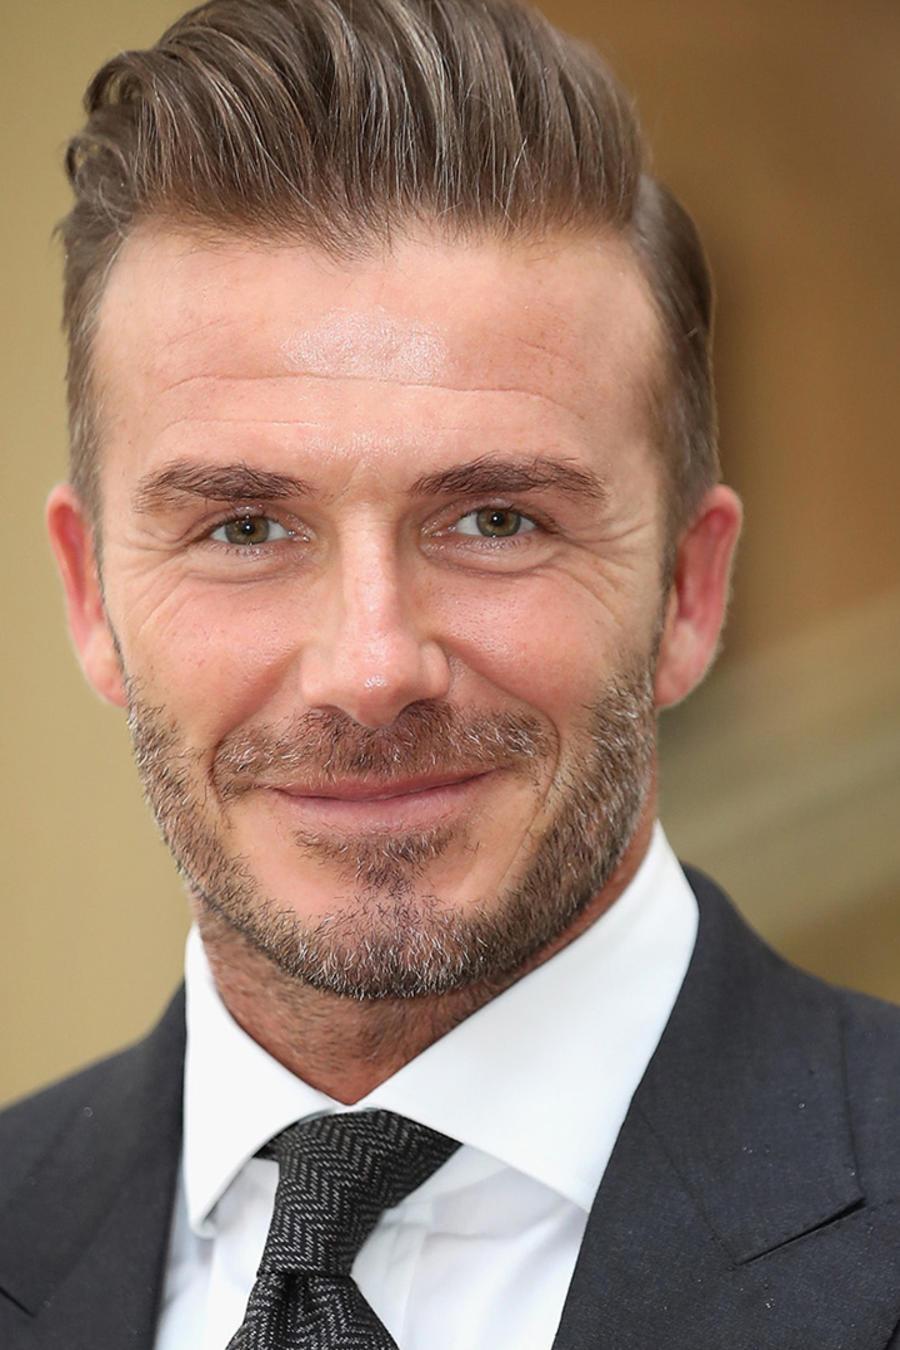 David Beckham queso